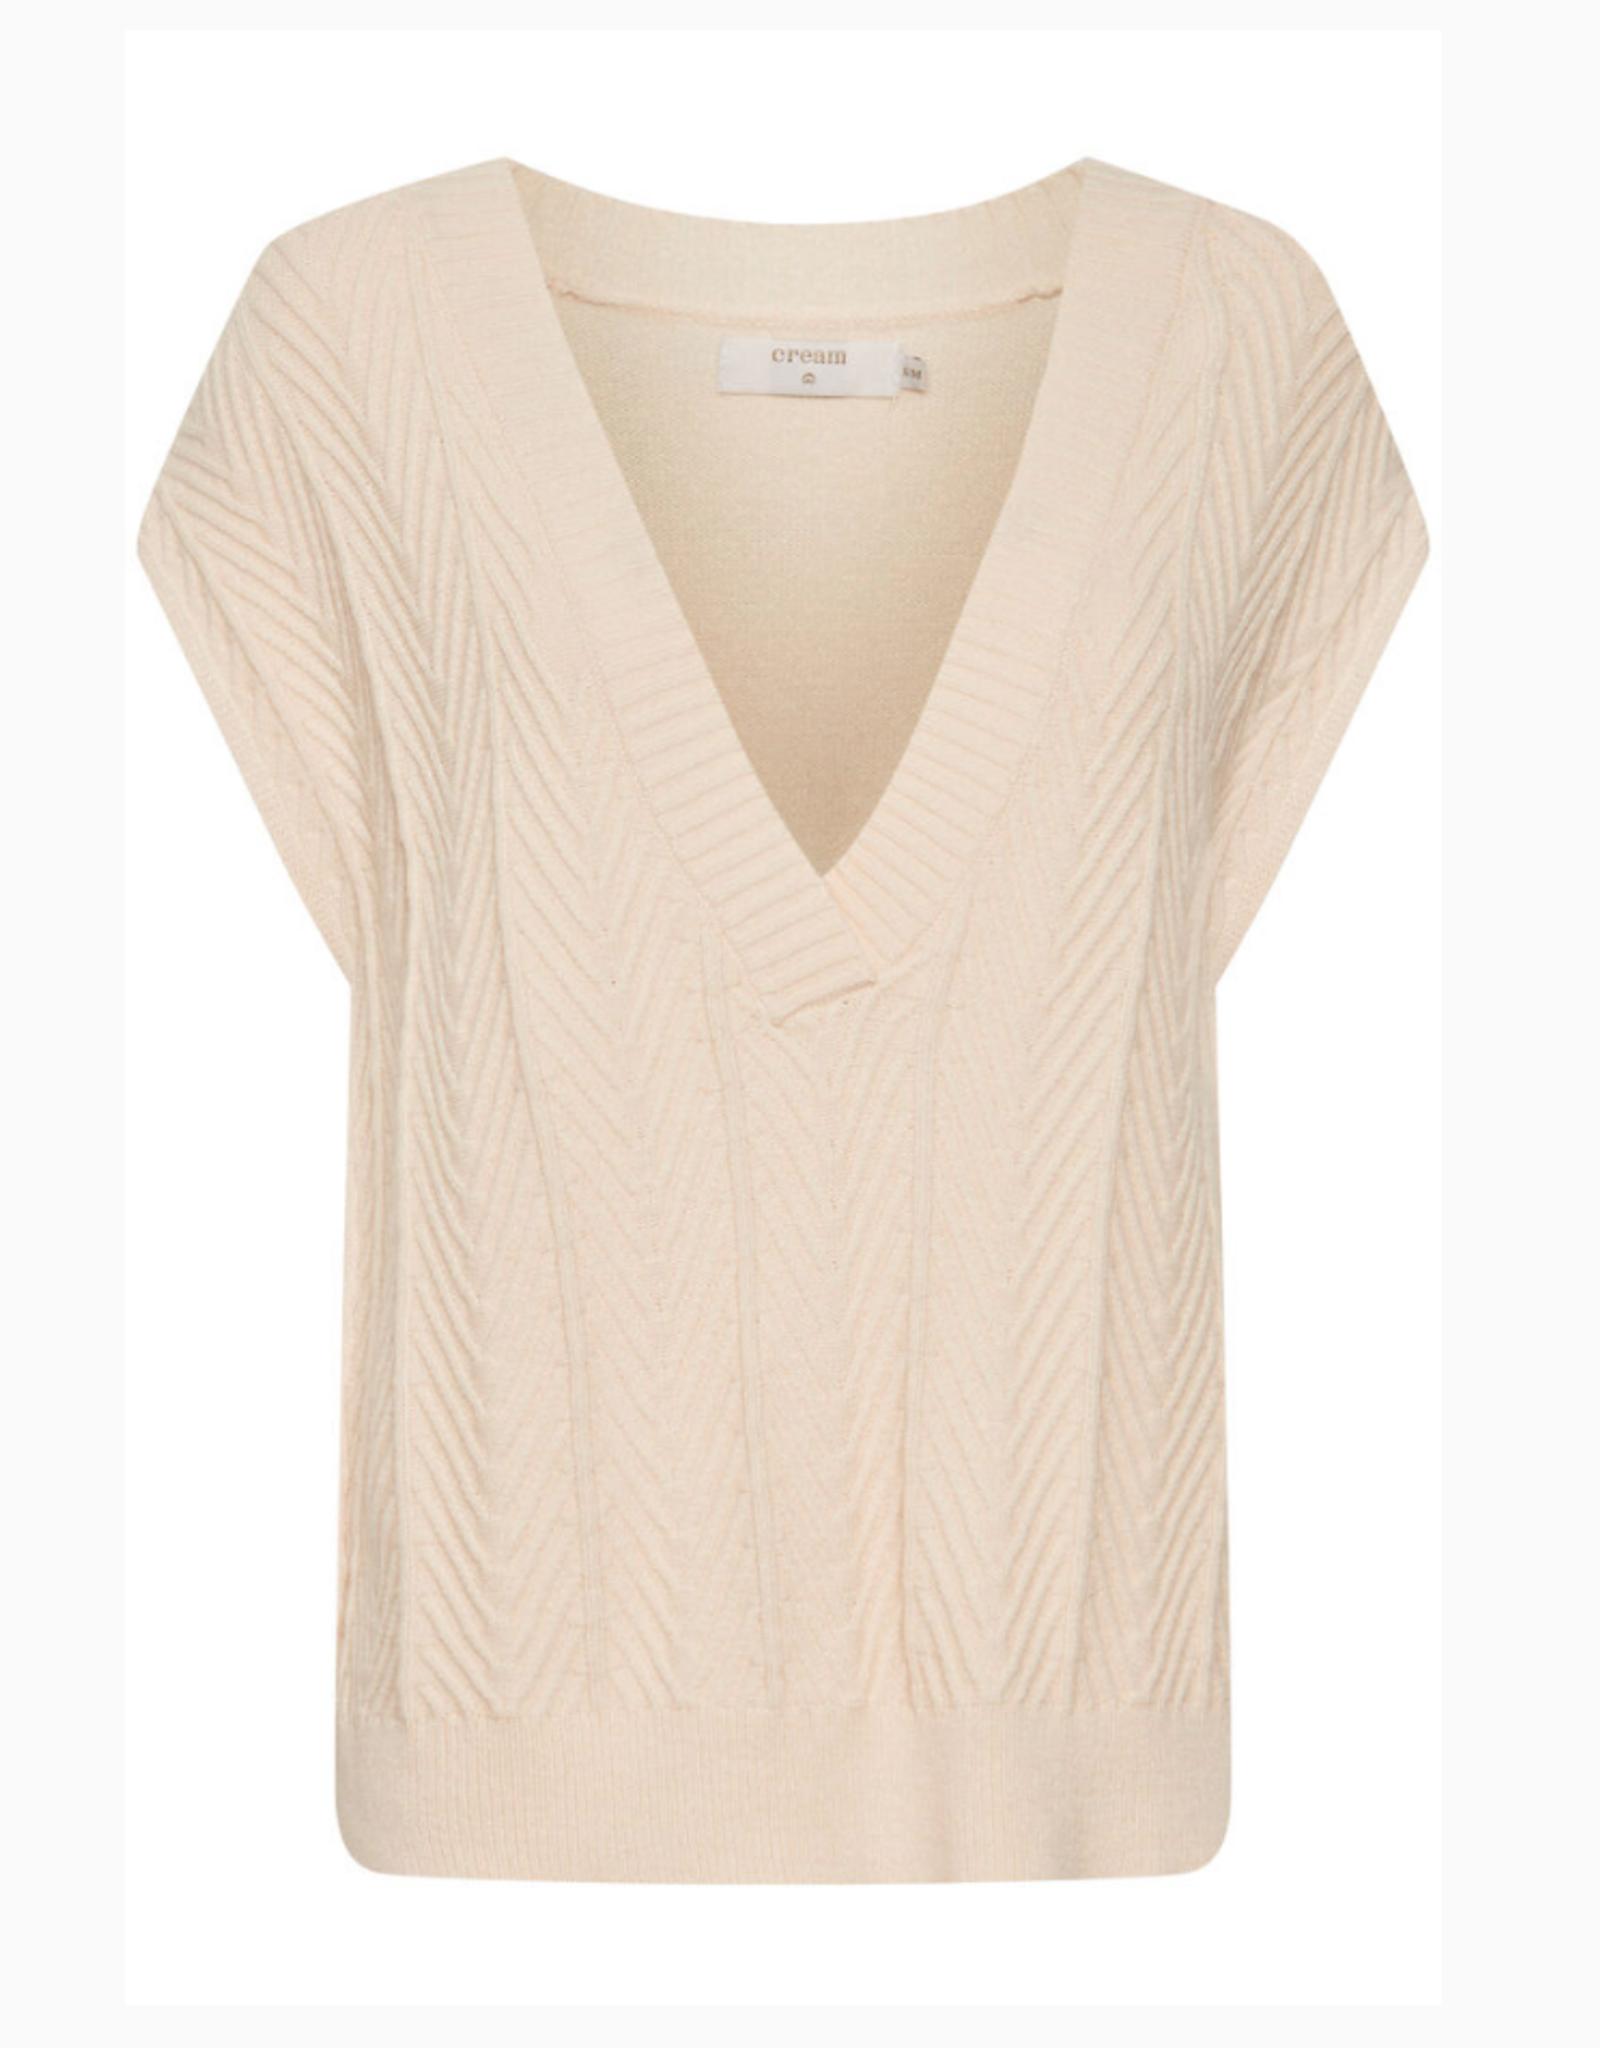 Cream Cream - CRMahima Sleeveless pullover